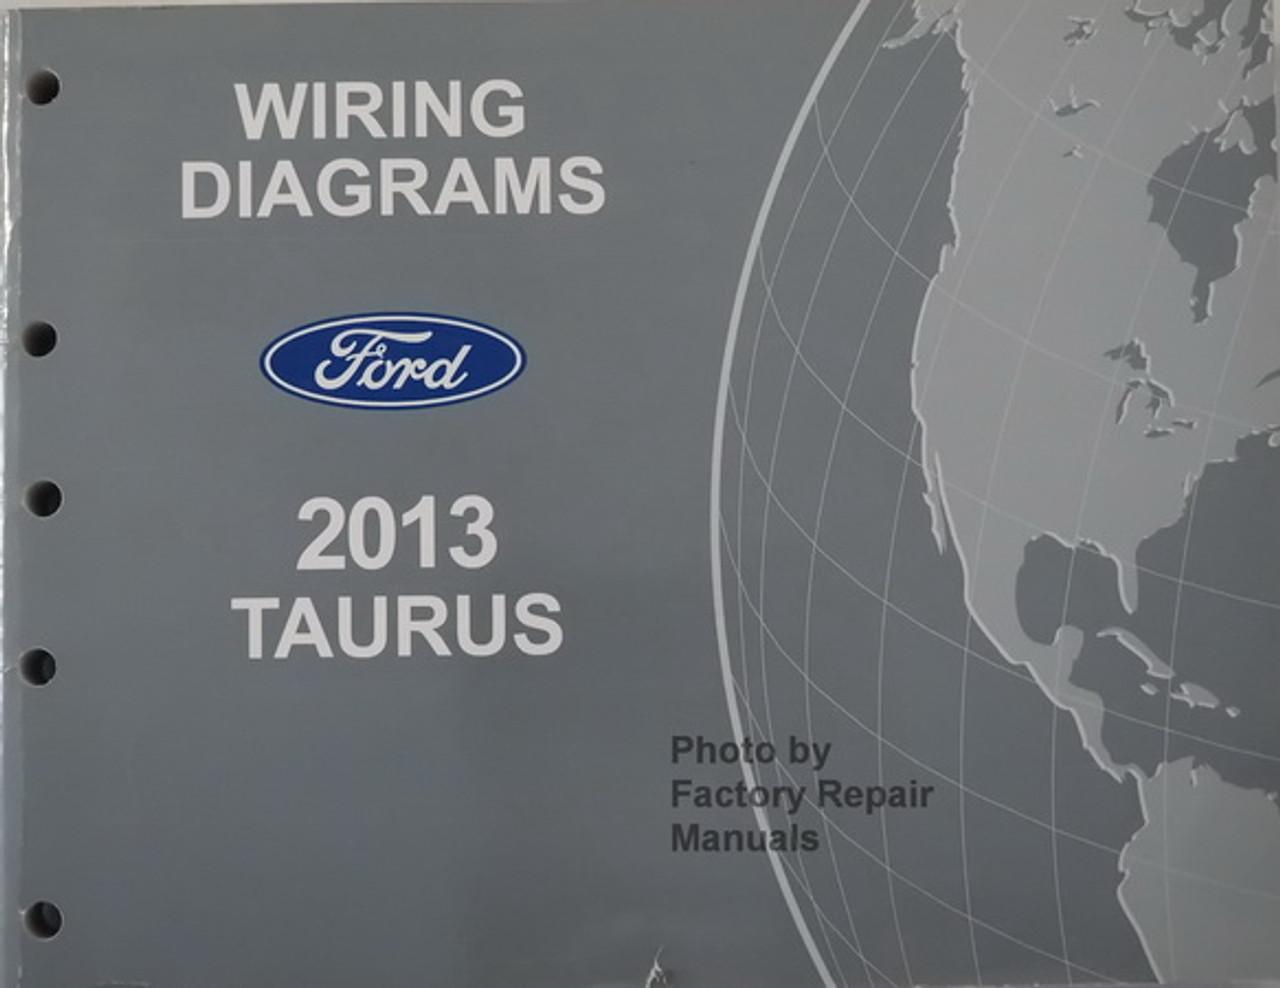 [EQHS_1162]  2013 Ford Taurus and Police Interceptor Sedan Electrical Wiring Diagrams  Original - Factory Repair Manuals | 2013 Ford Taurus Engine Diagram |  | Factory Repair Manuals